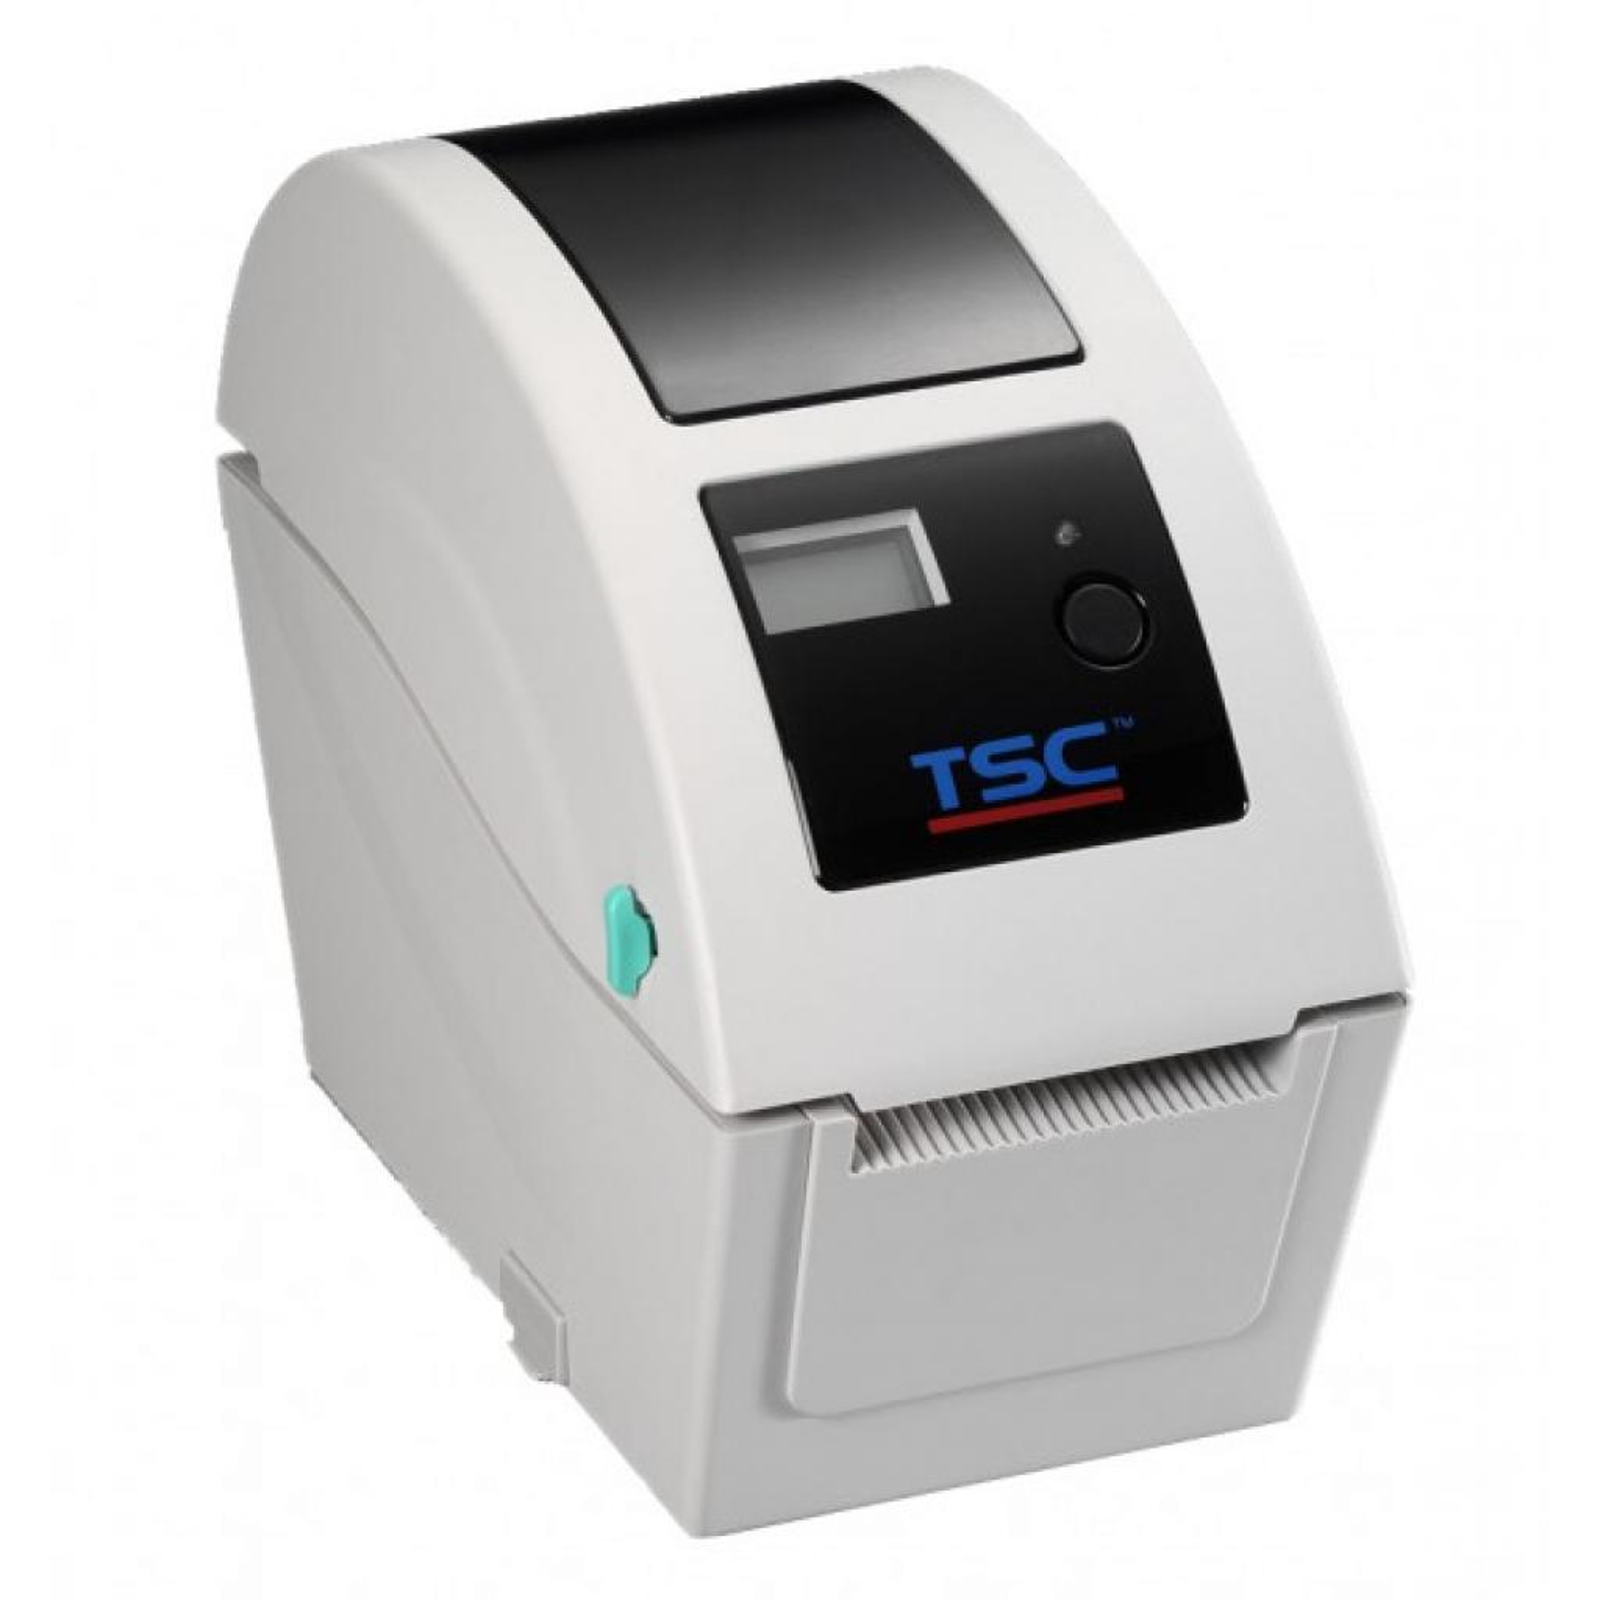 Принтер этикеток TSC TDP-324 (4020000153)